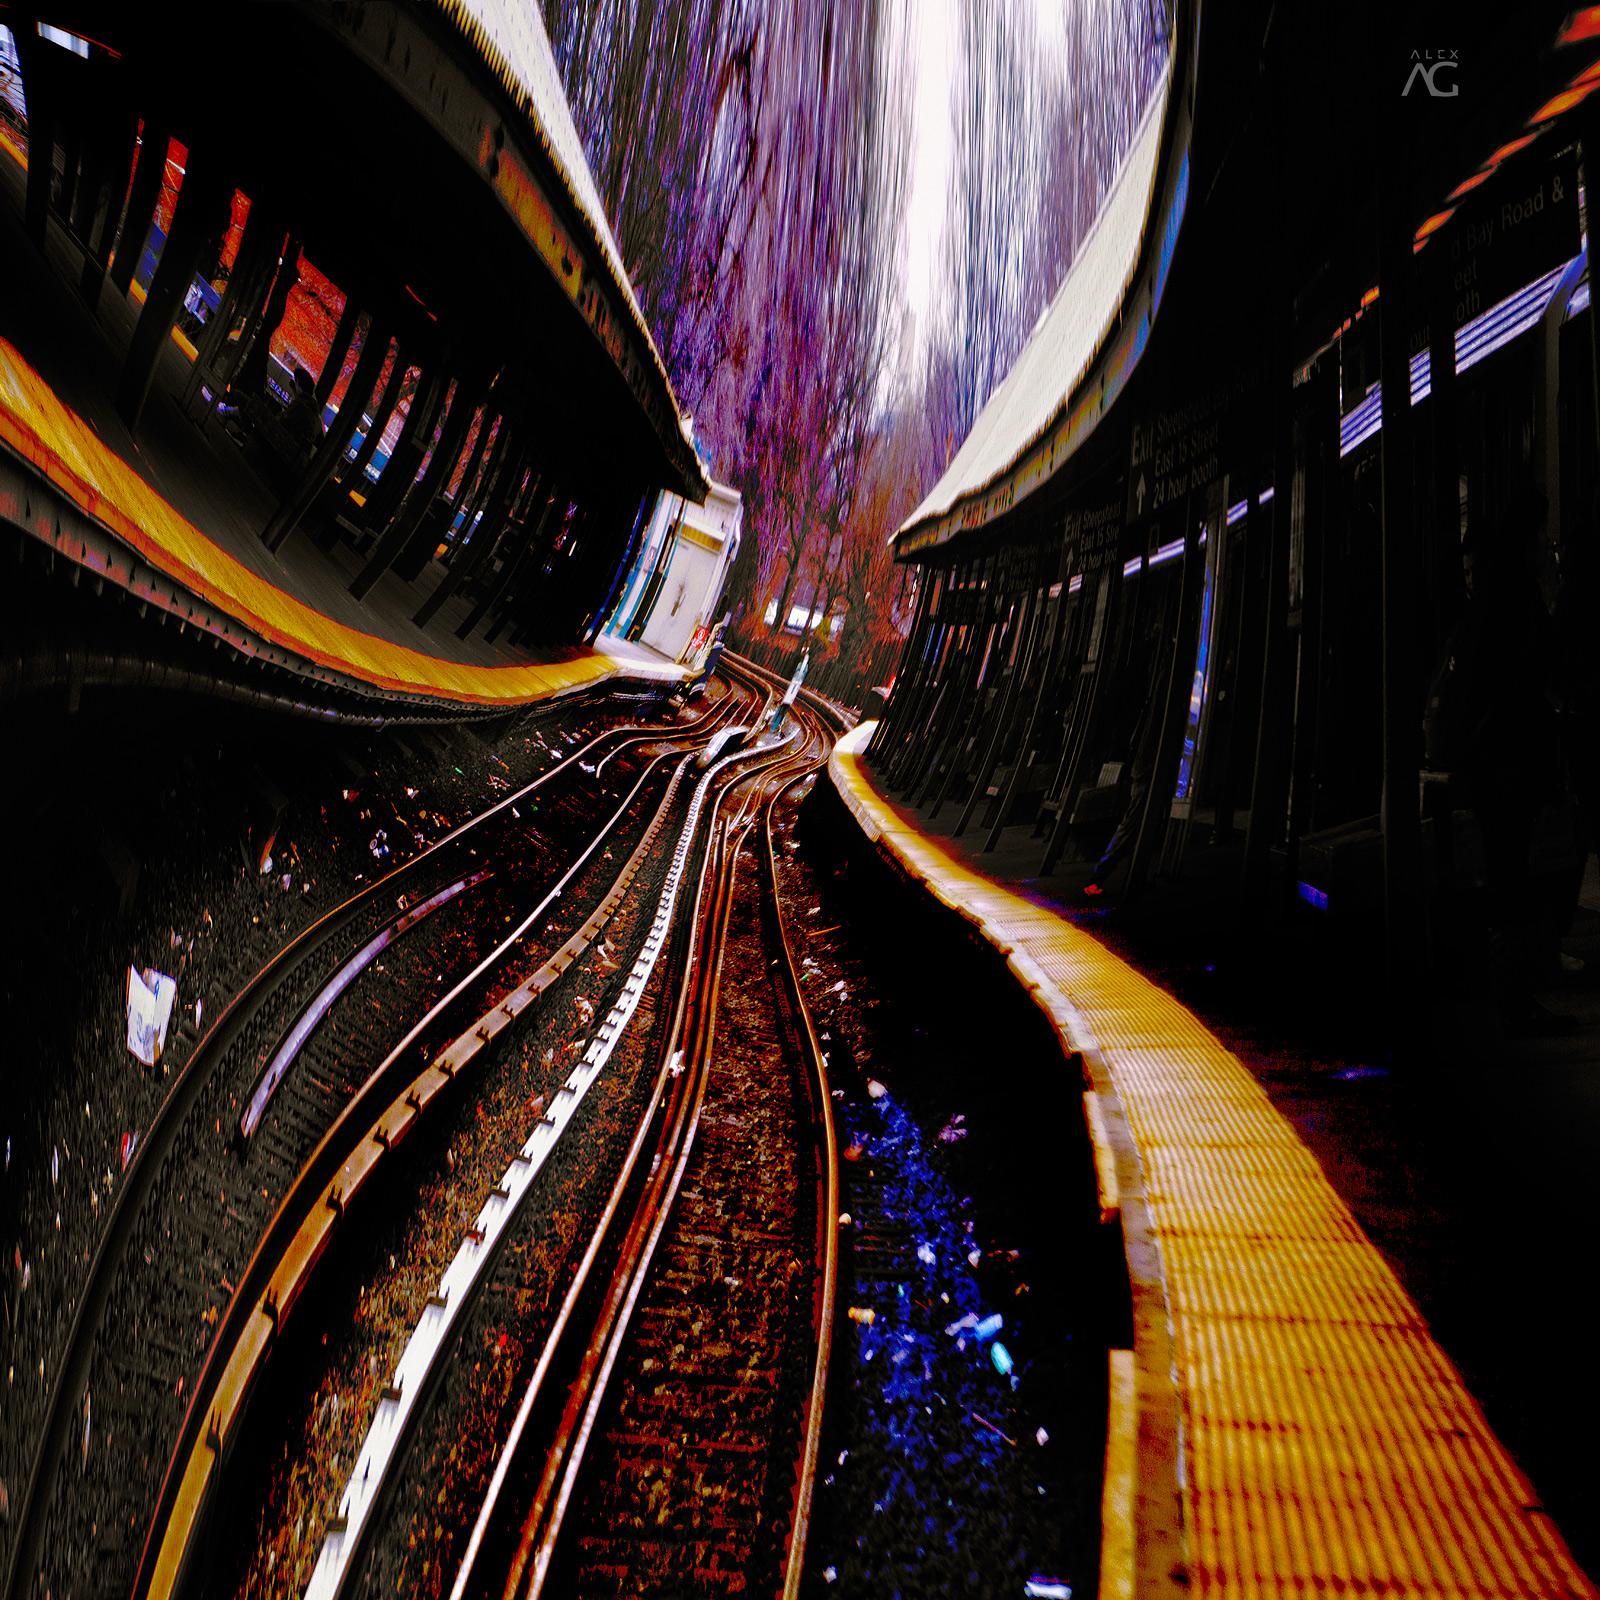 TrainTracksCloseupOnSheepsheadBayCloudyDay_warped_1600